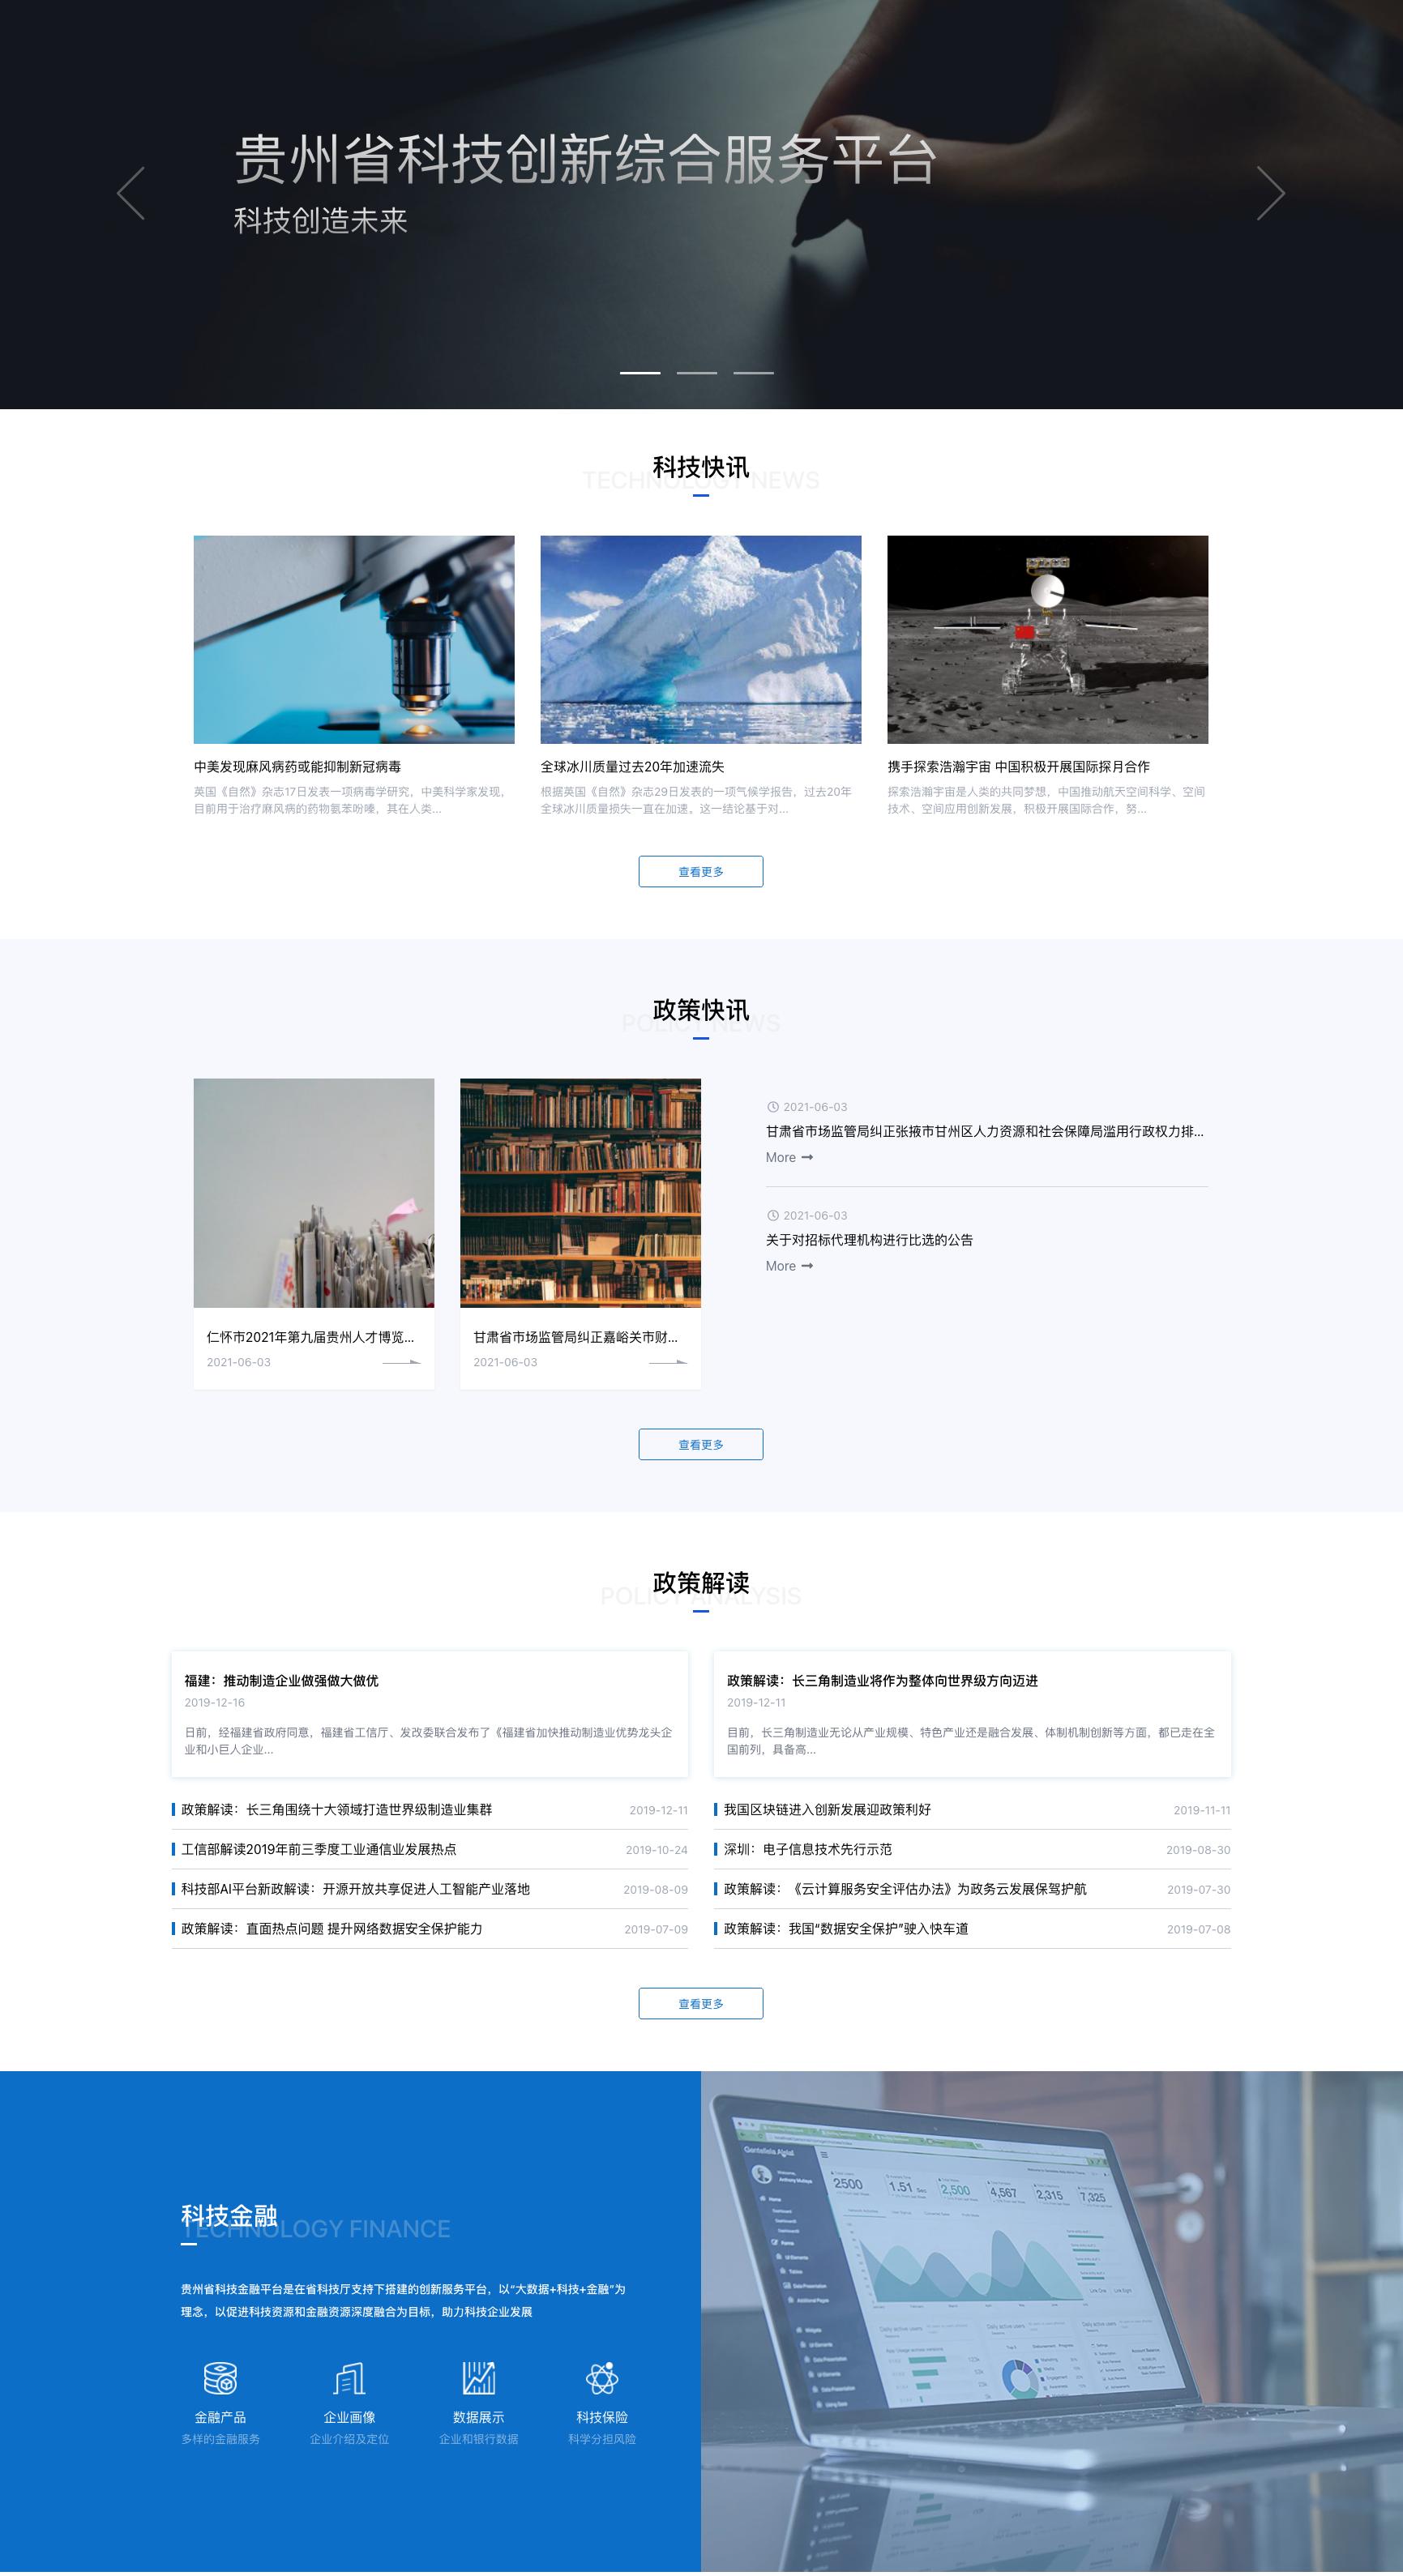 qiankeji.com